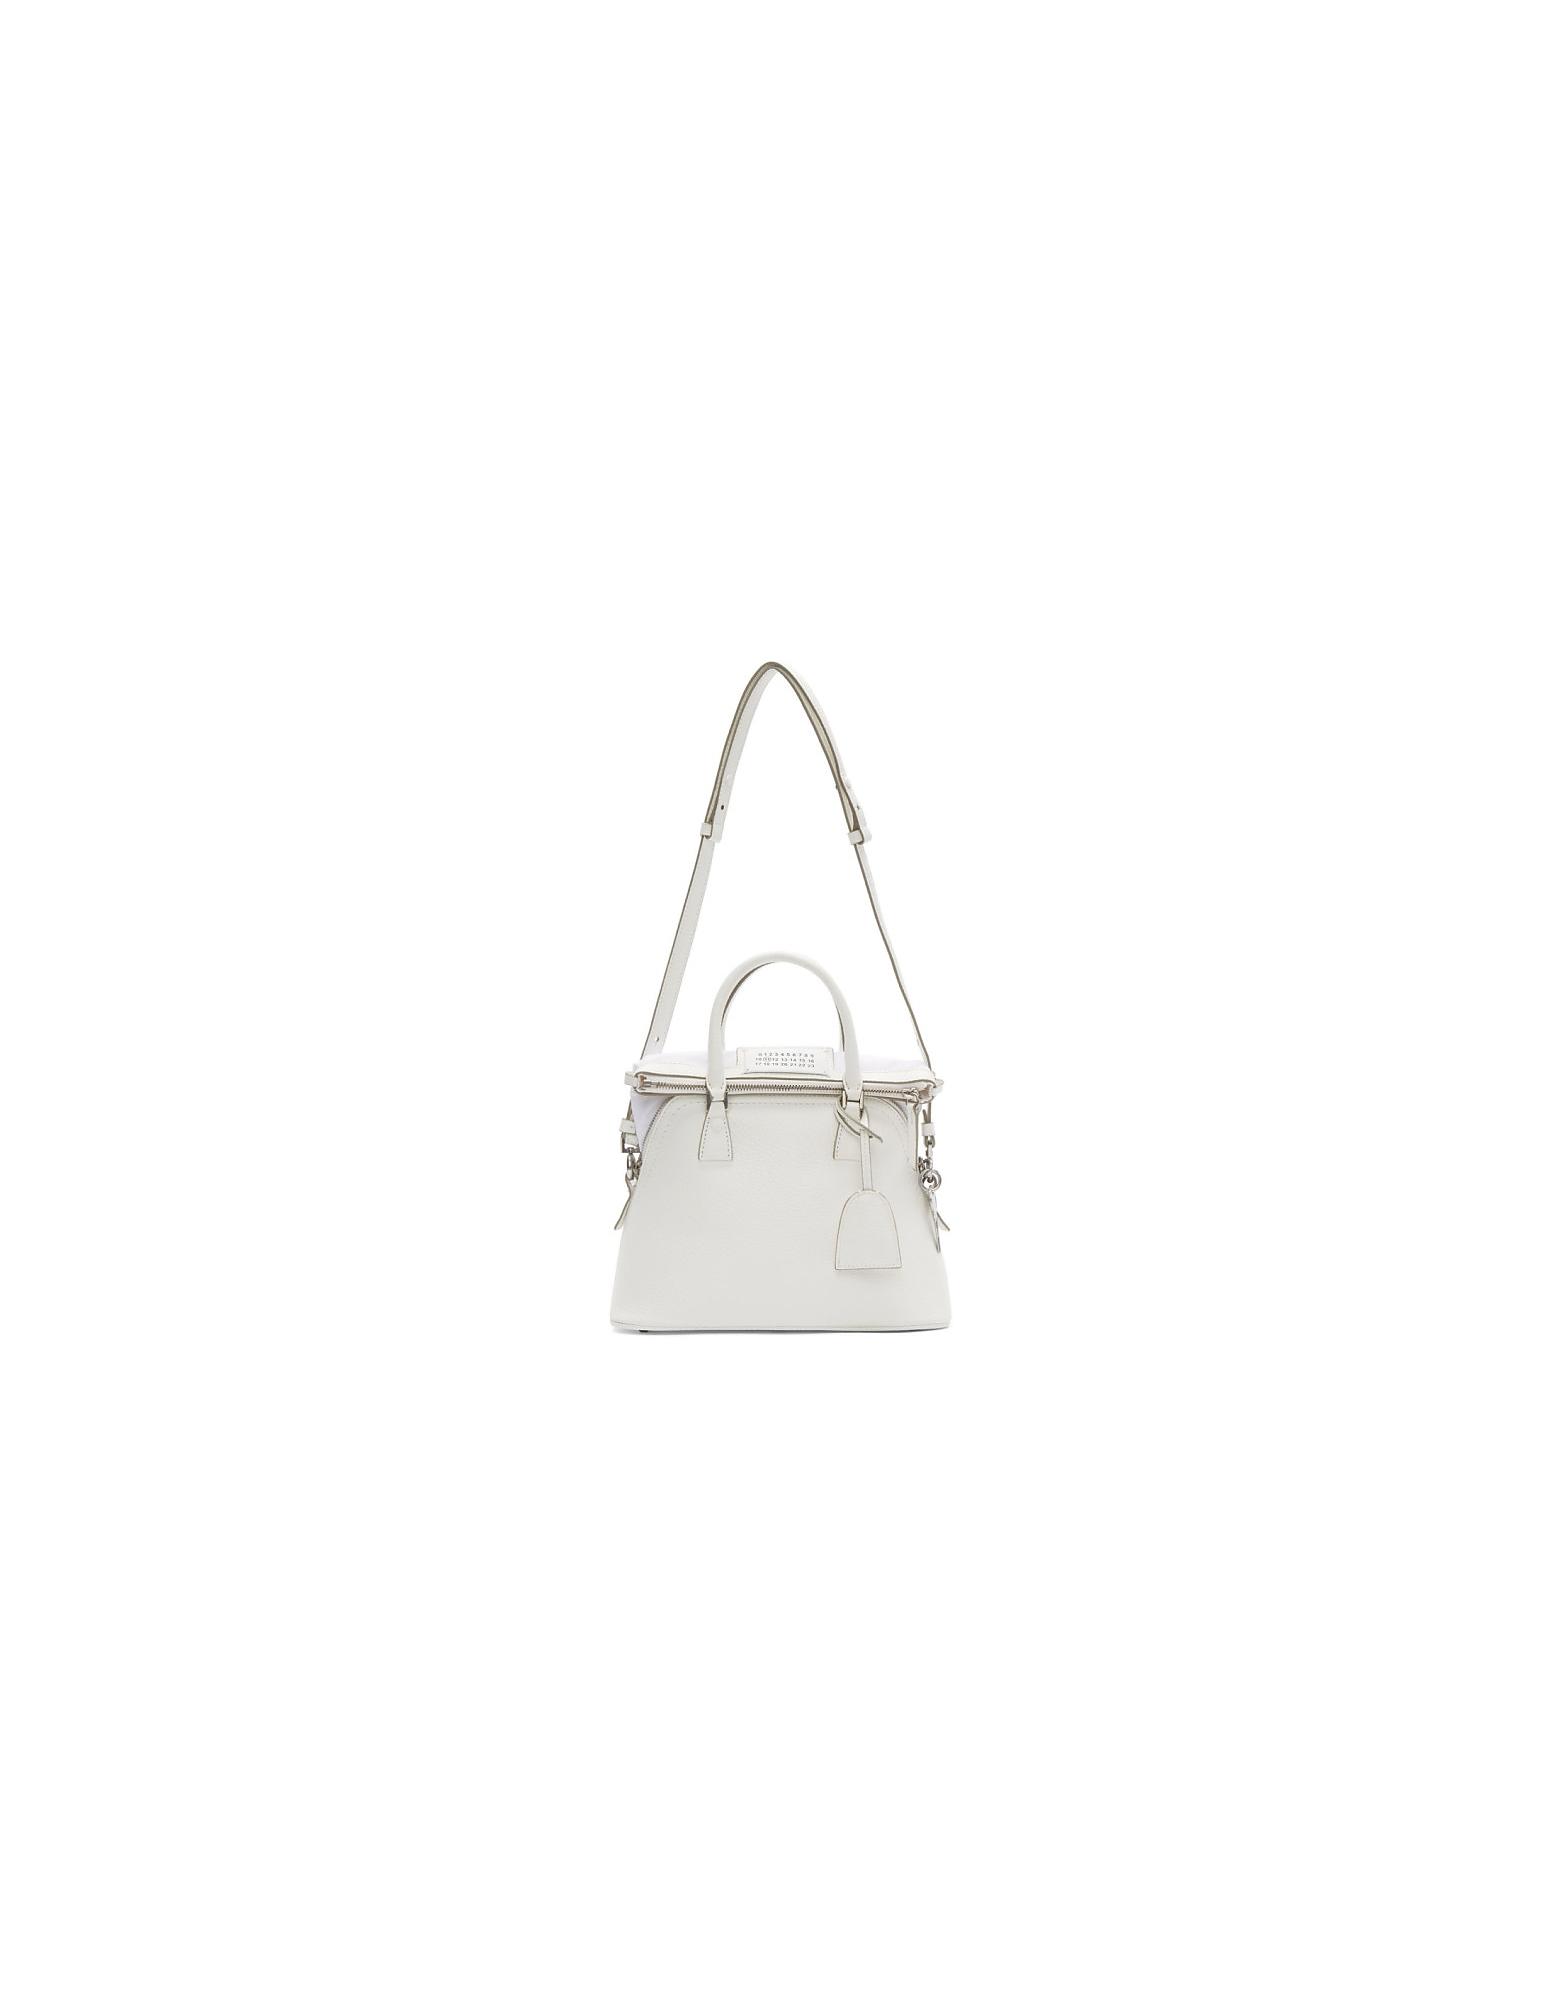 Maison Margiela Designer Handbags, White Medium 5AC Bag